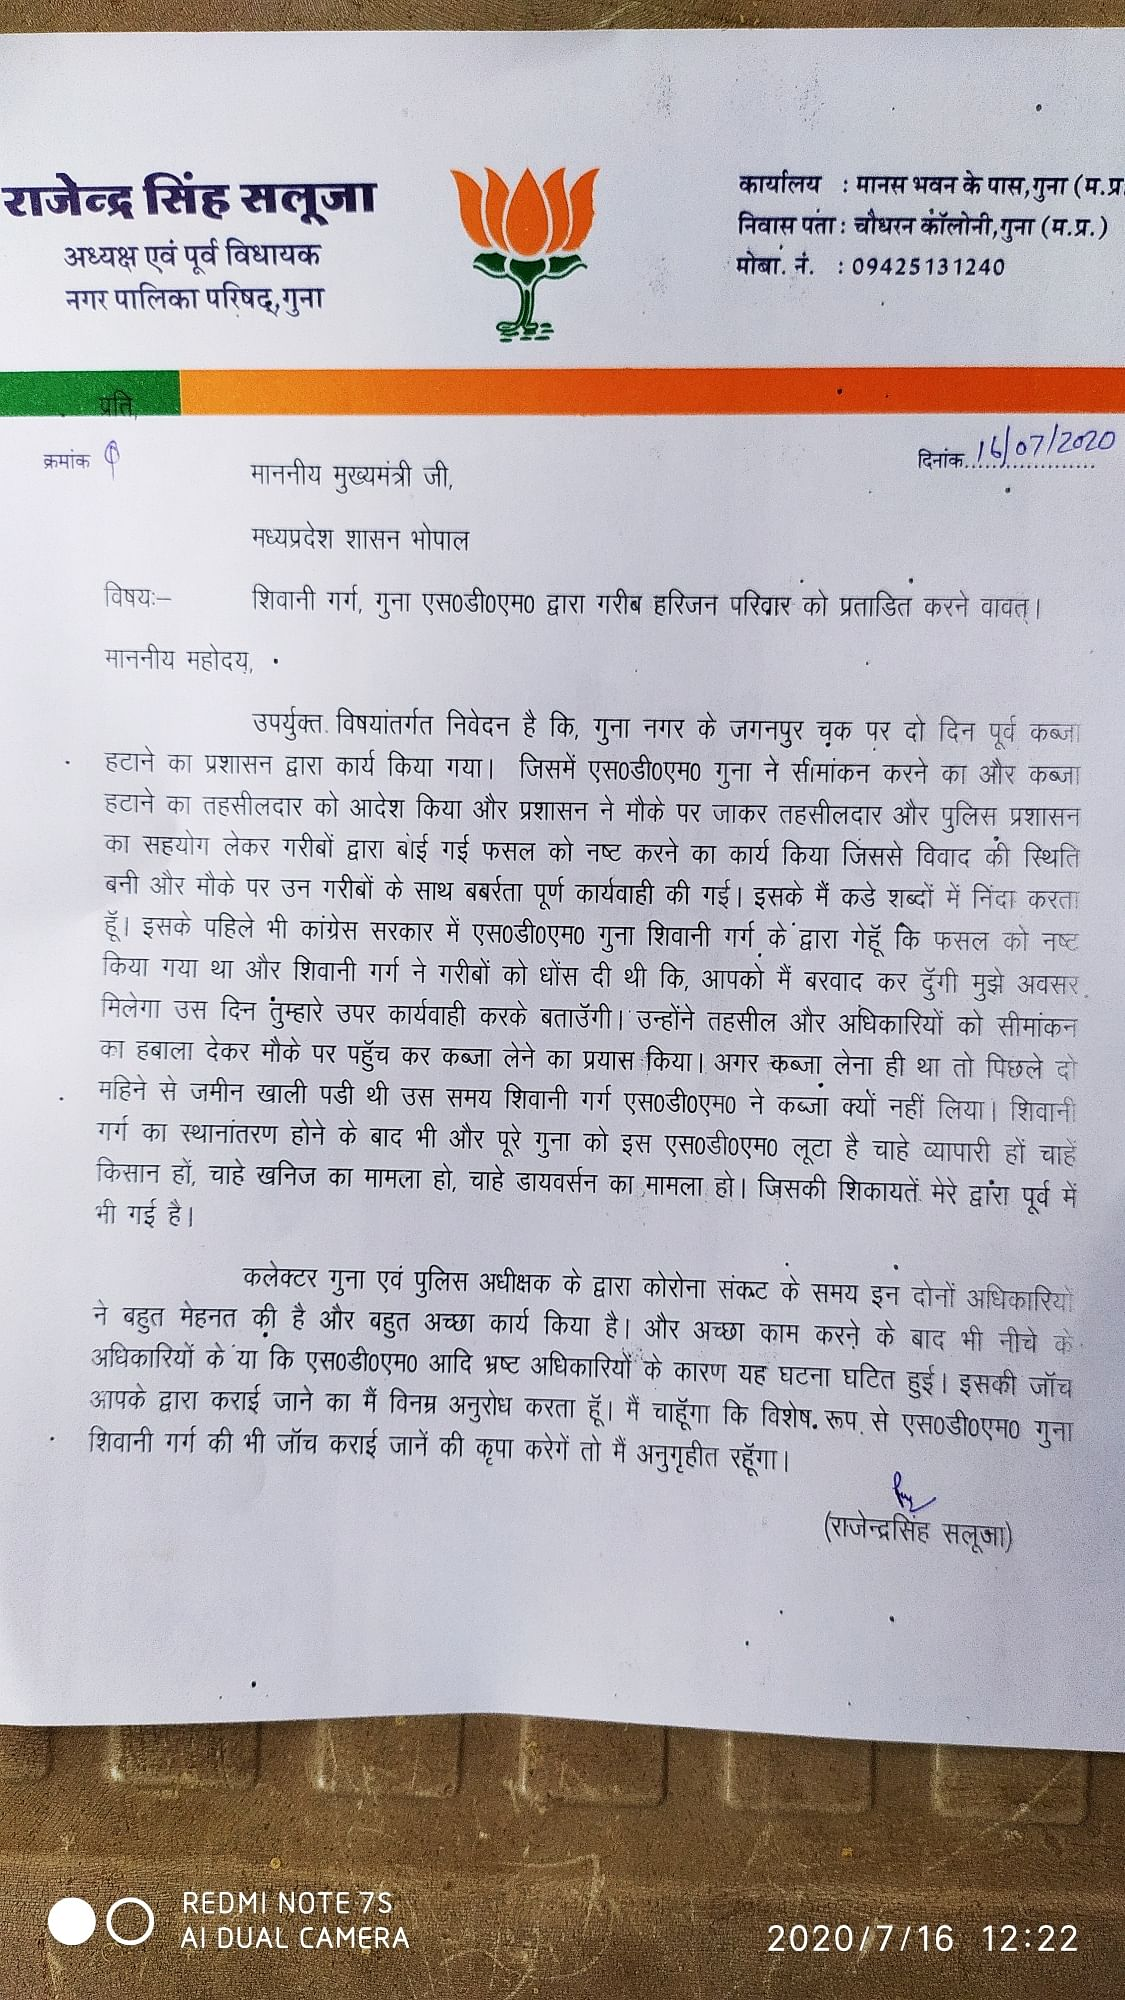 भाजपा नेता का मुख्यमंत्री को पत्र